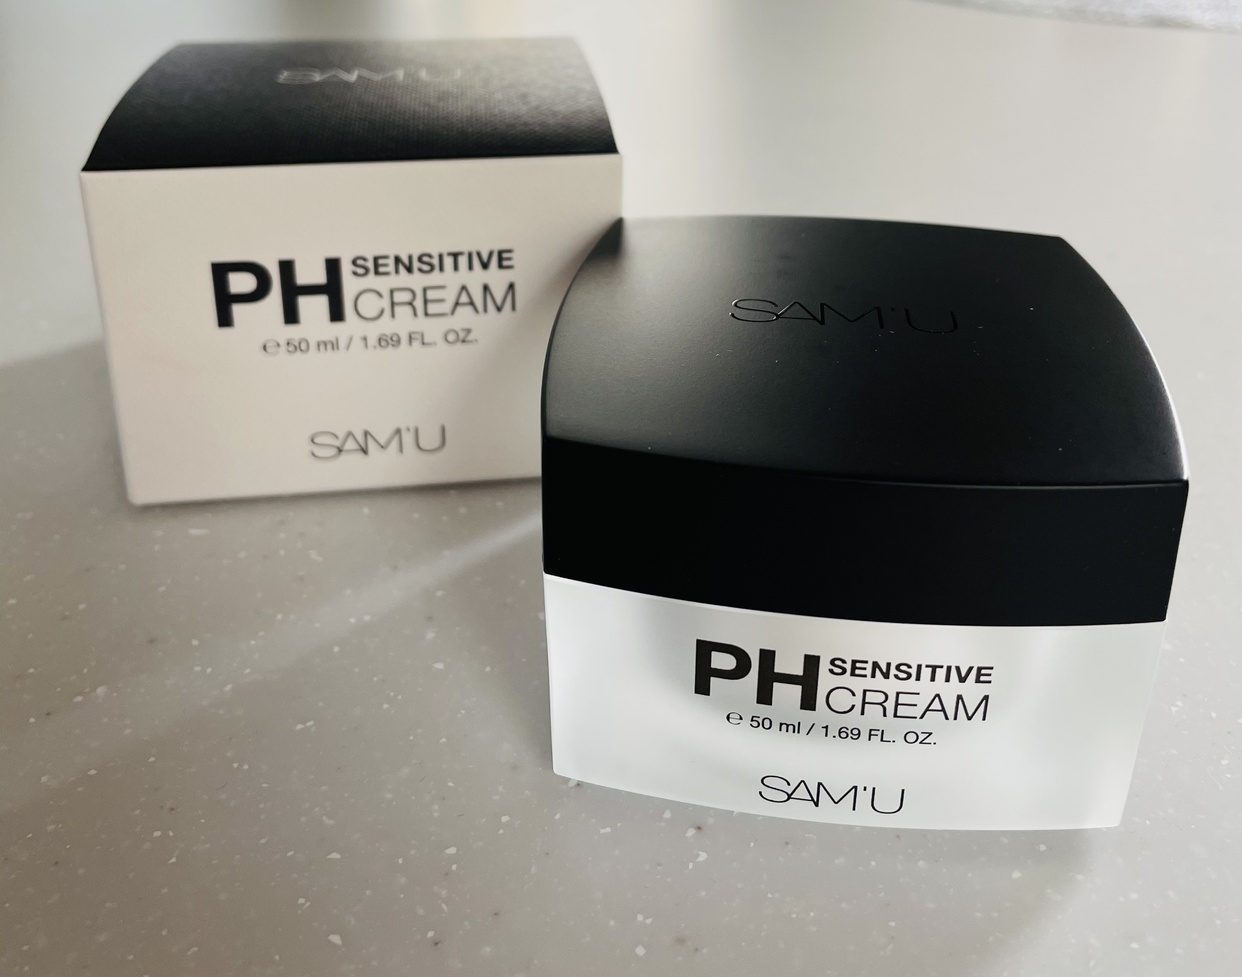 SAM'U(サミュ) PHセンシティブクリームを使ったhiiiさんのクチコミ画像